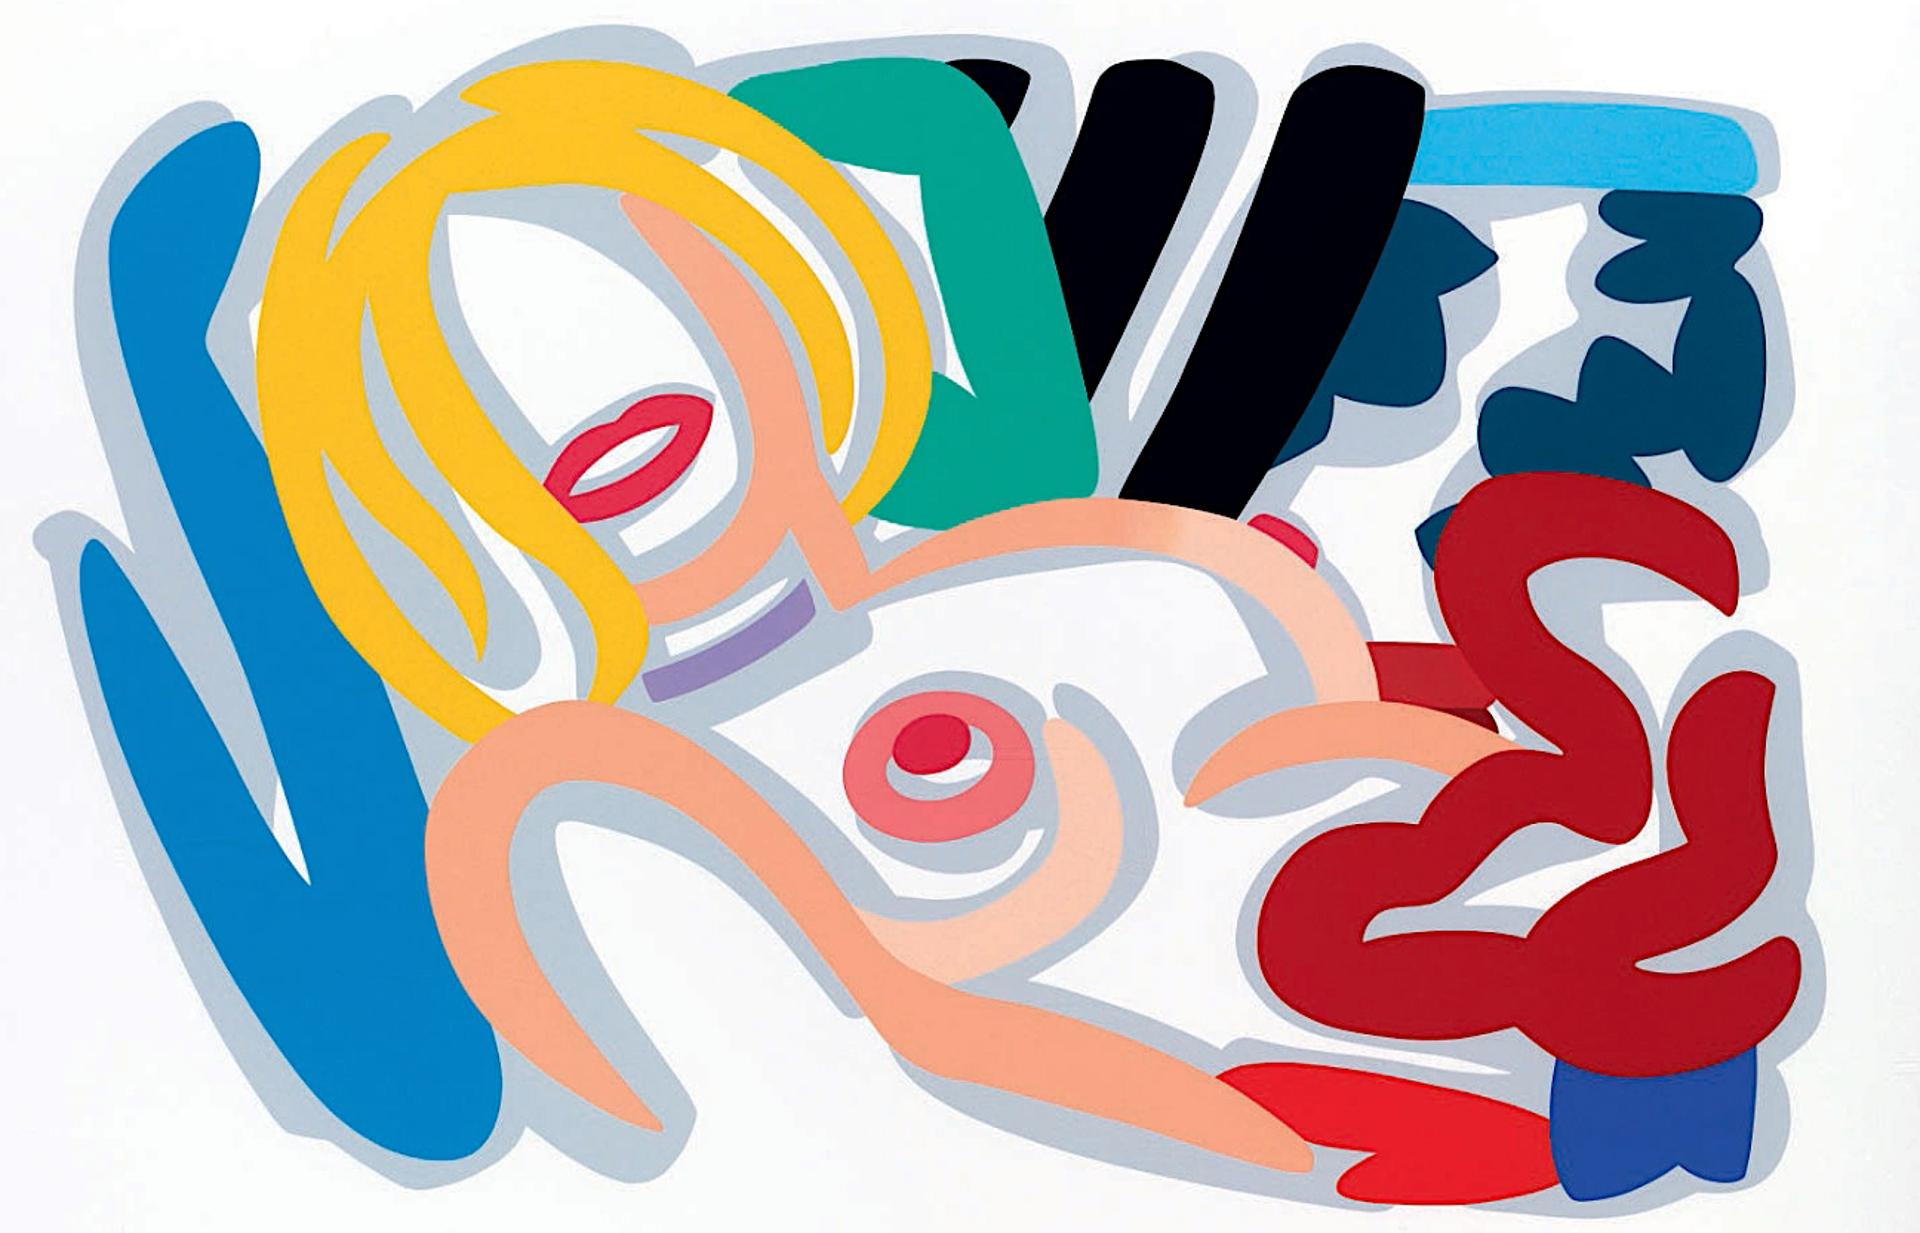 Big Blonde with Choker by Tom Wesselmann